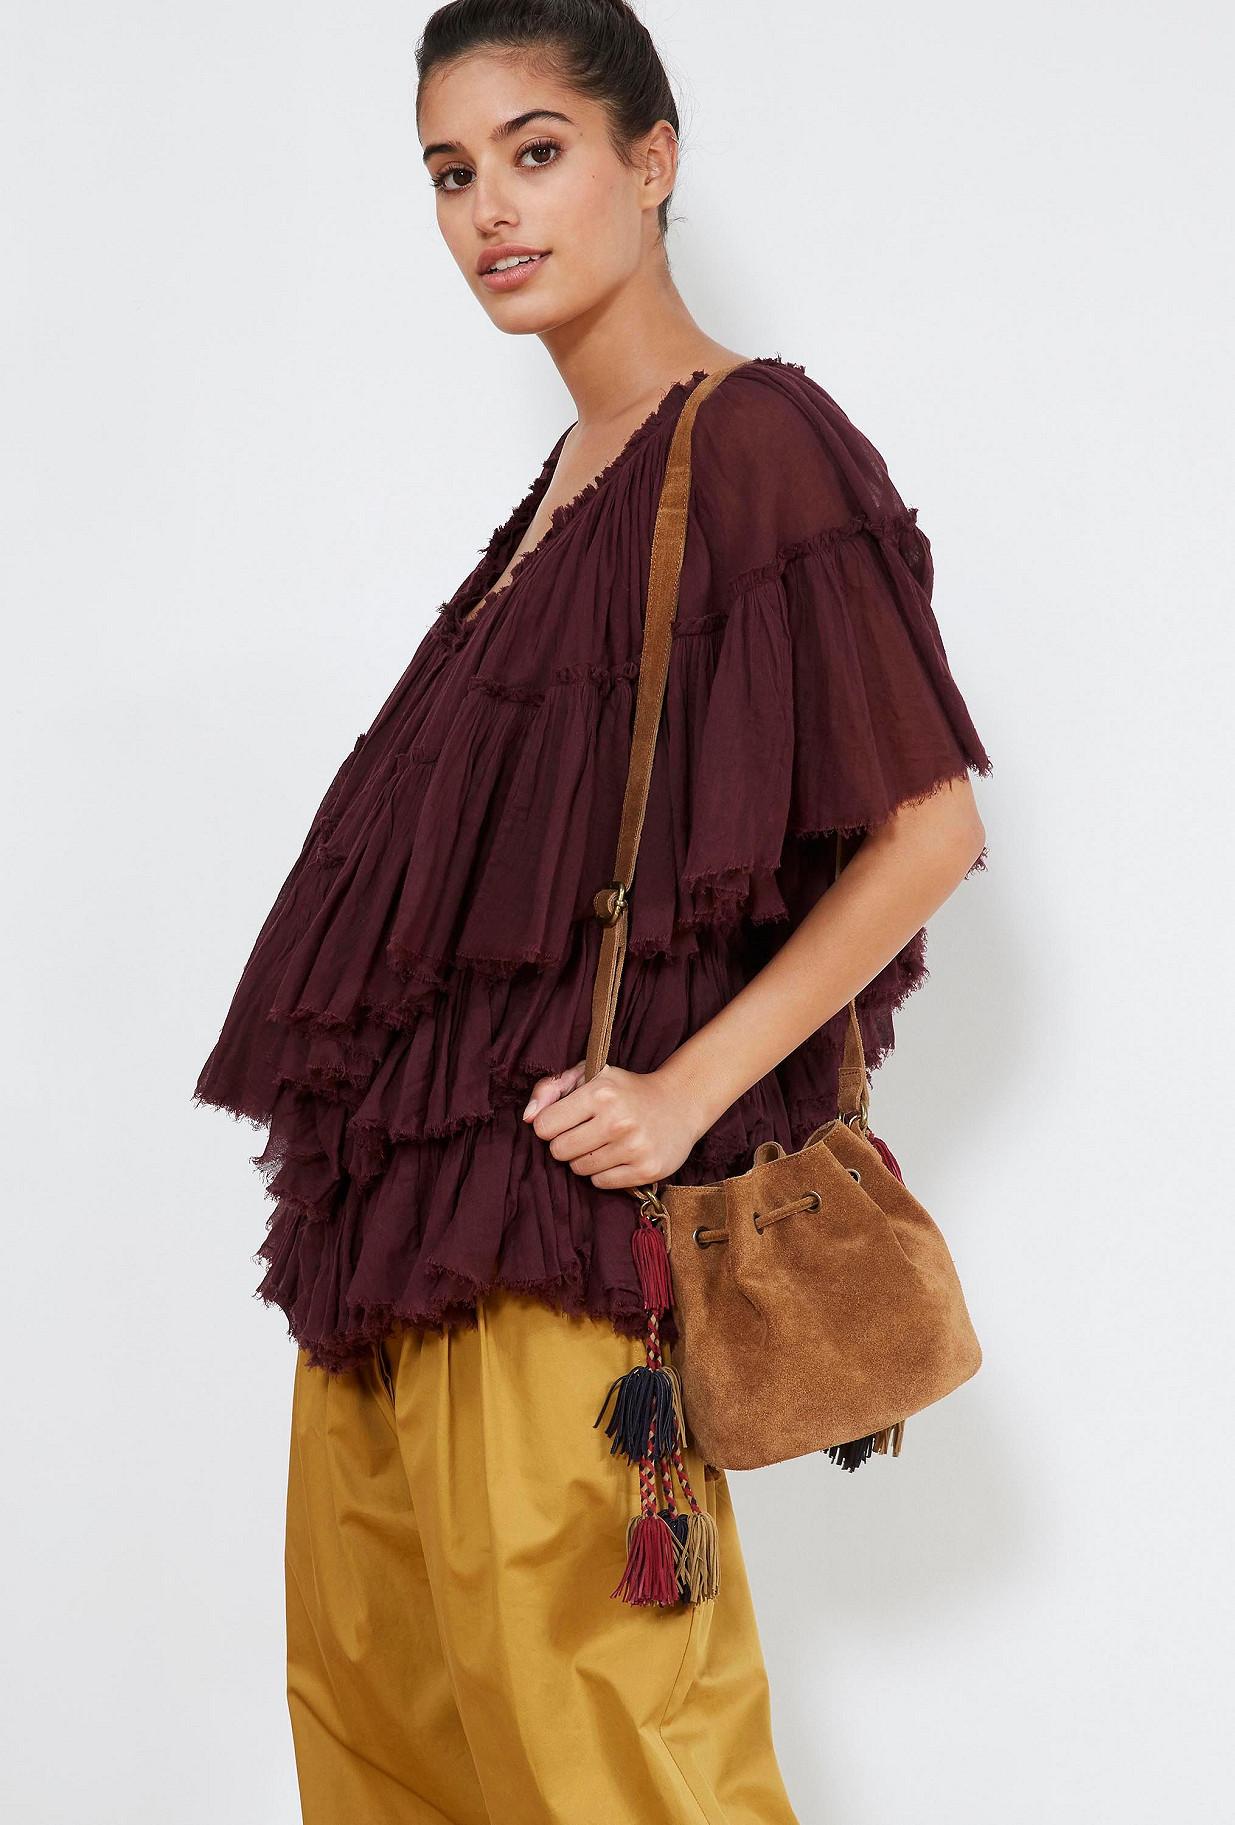 clothes store ACCESSORIES  Cheyenne french designer fashion Paris